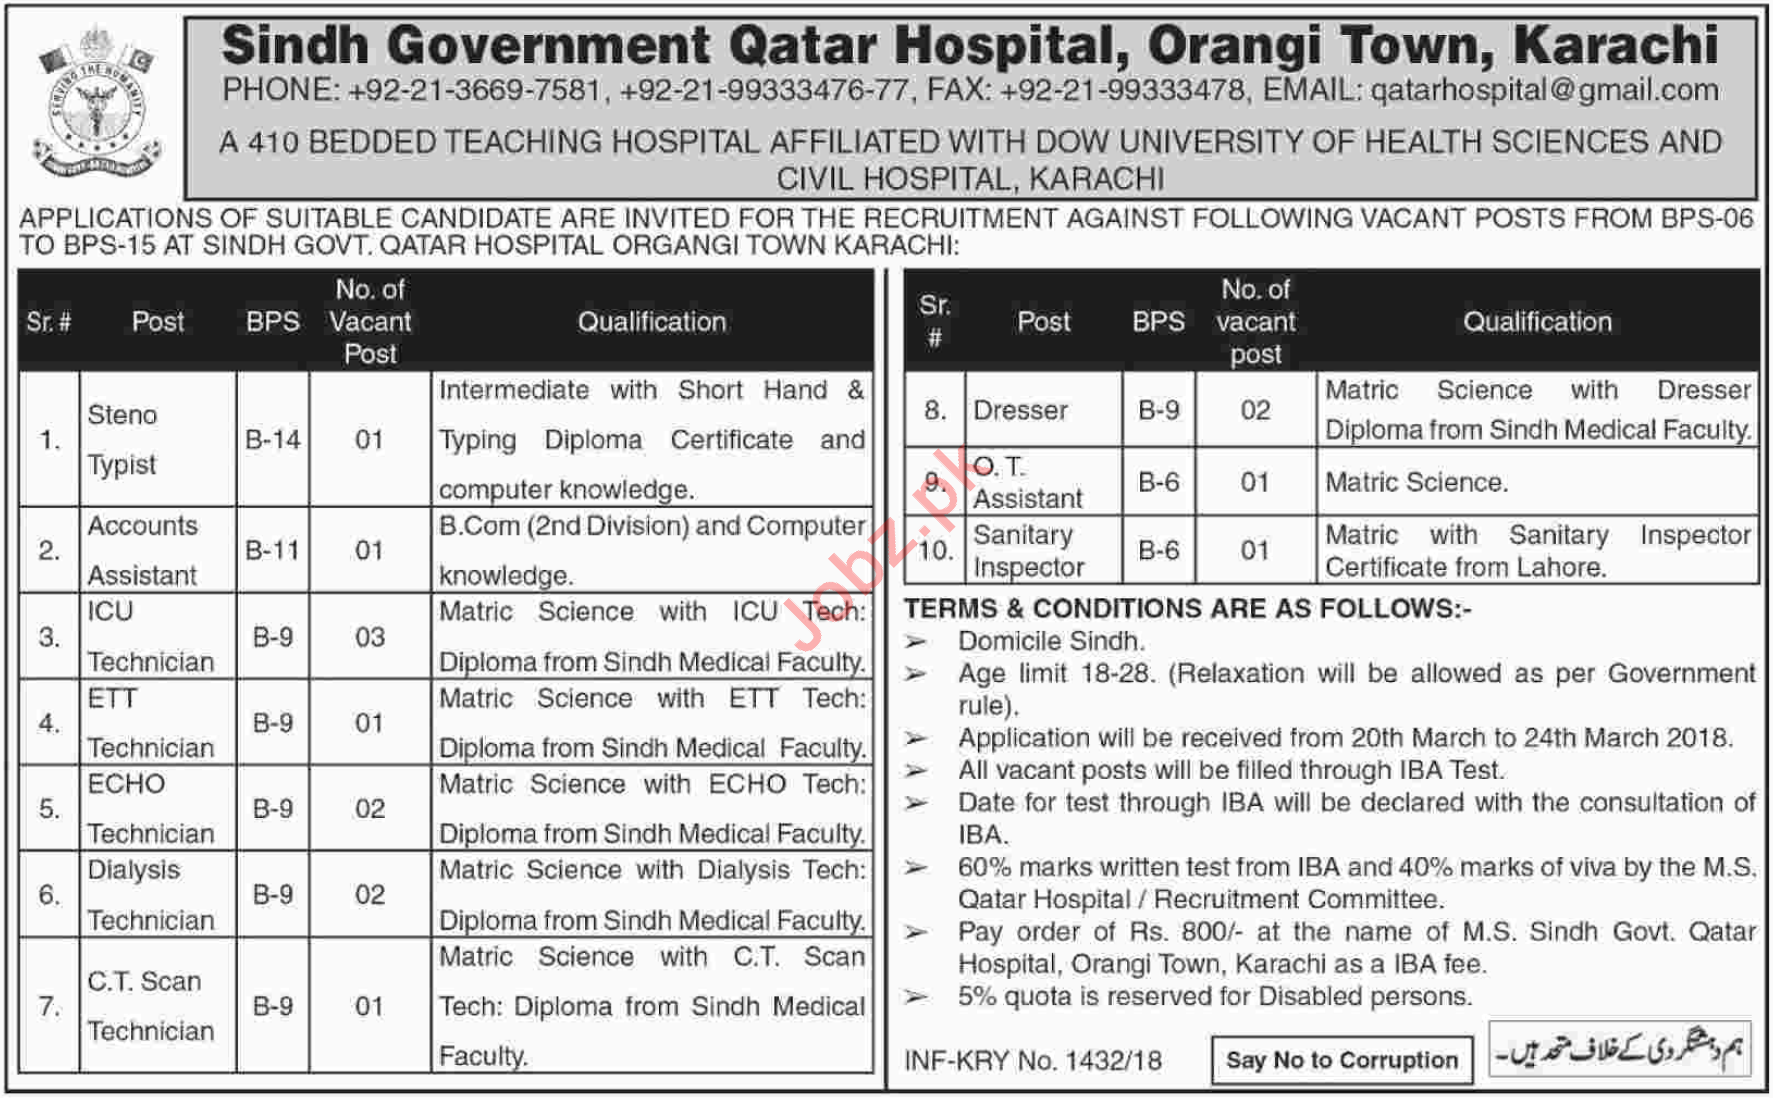 Sindh Government Qatar Hospital Karachi Jobs 2018